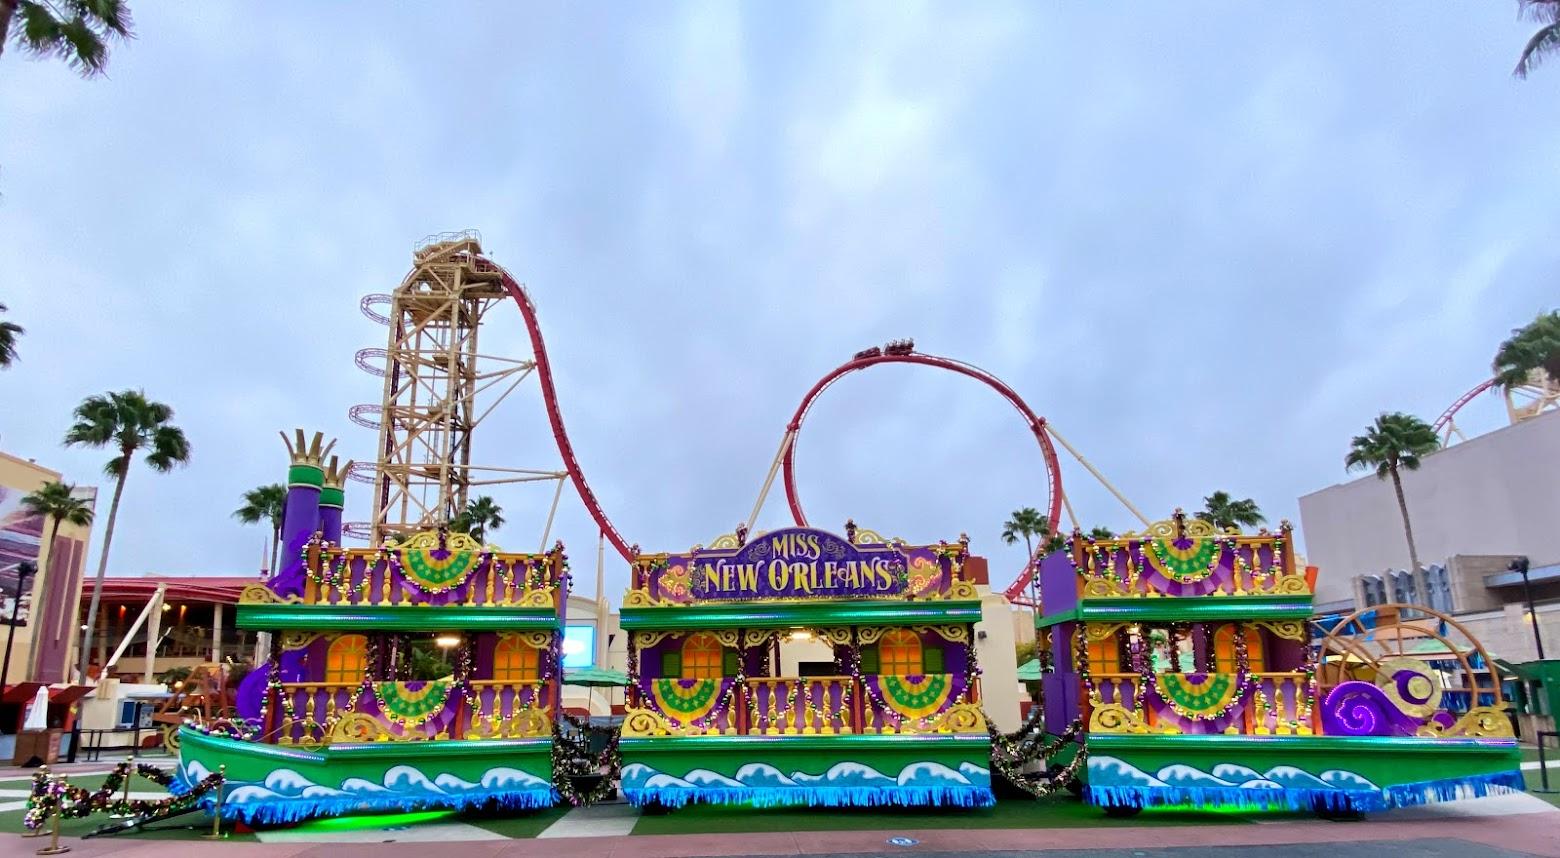 Rip Ride Rockit/Universal Studios - Photo by Keith Kastelic